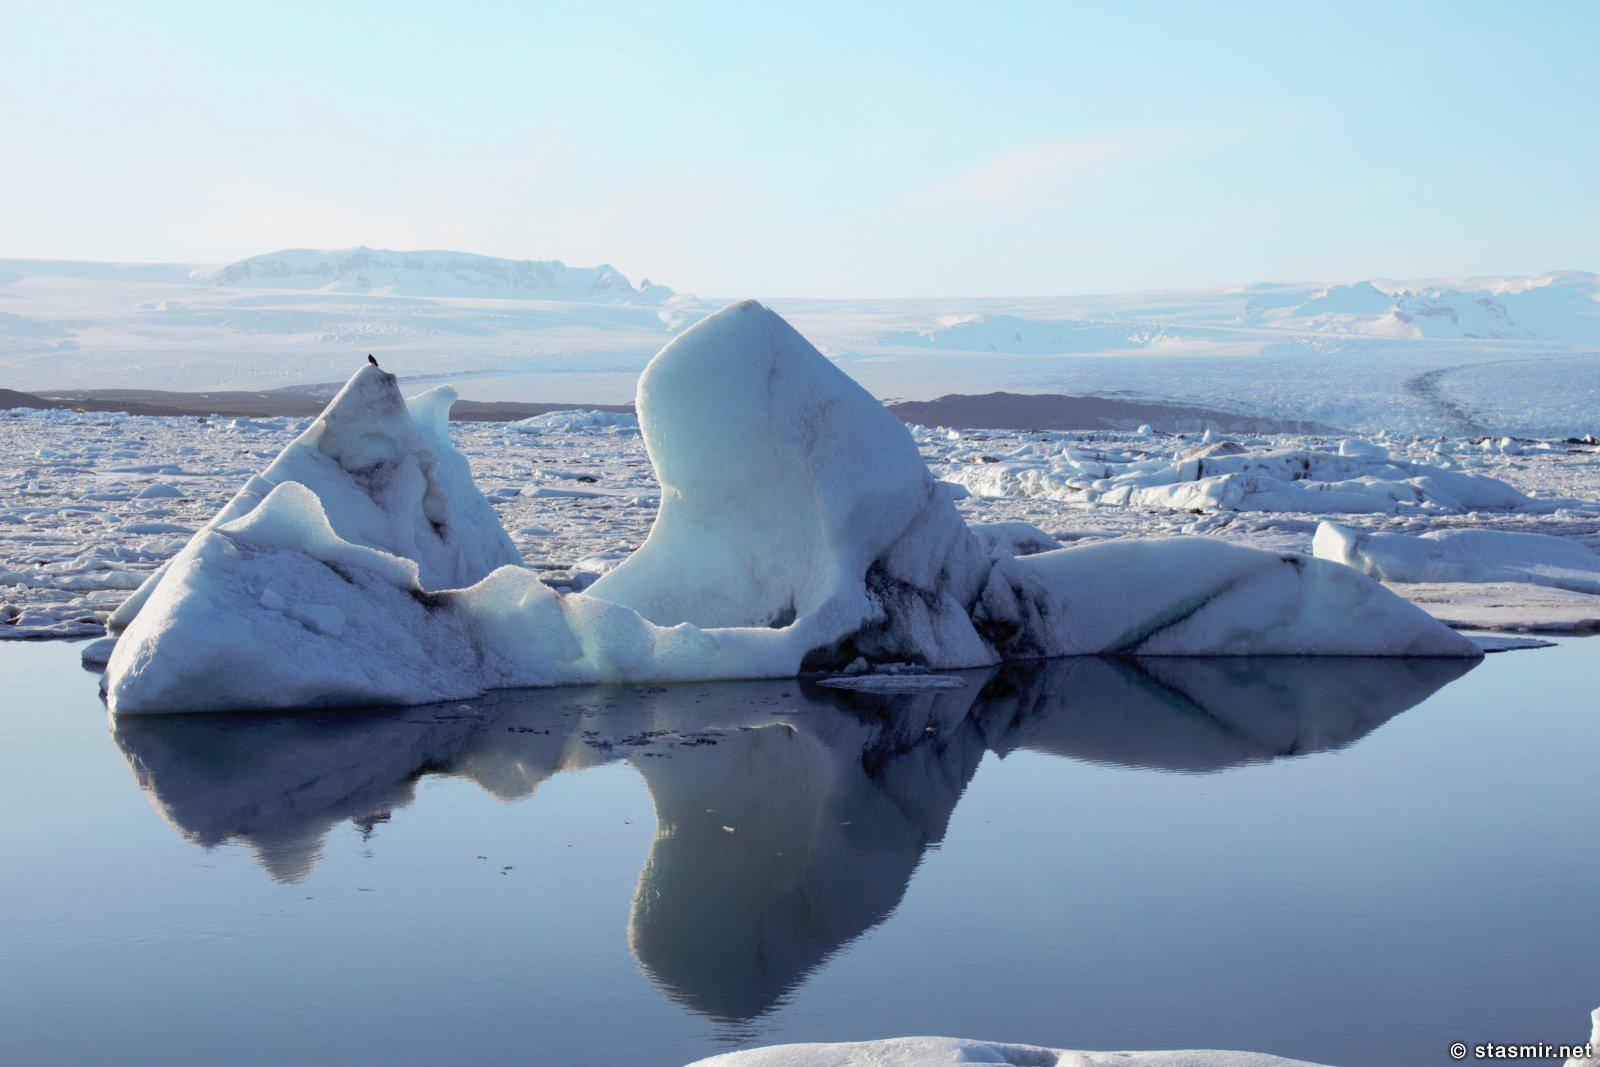 Ледяная лагуна - Йёкюльсаурлоун, фото Стасмир, photo Stasmir